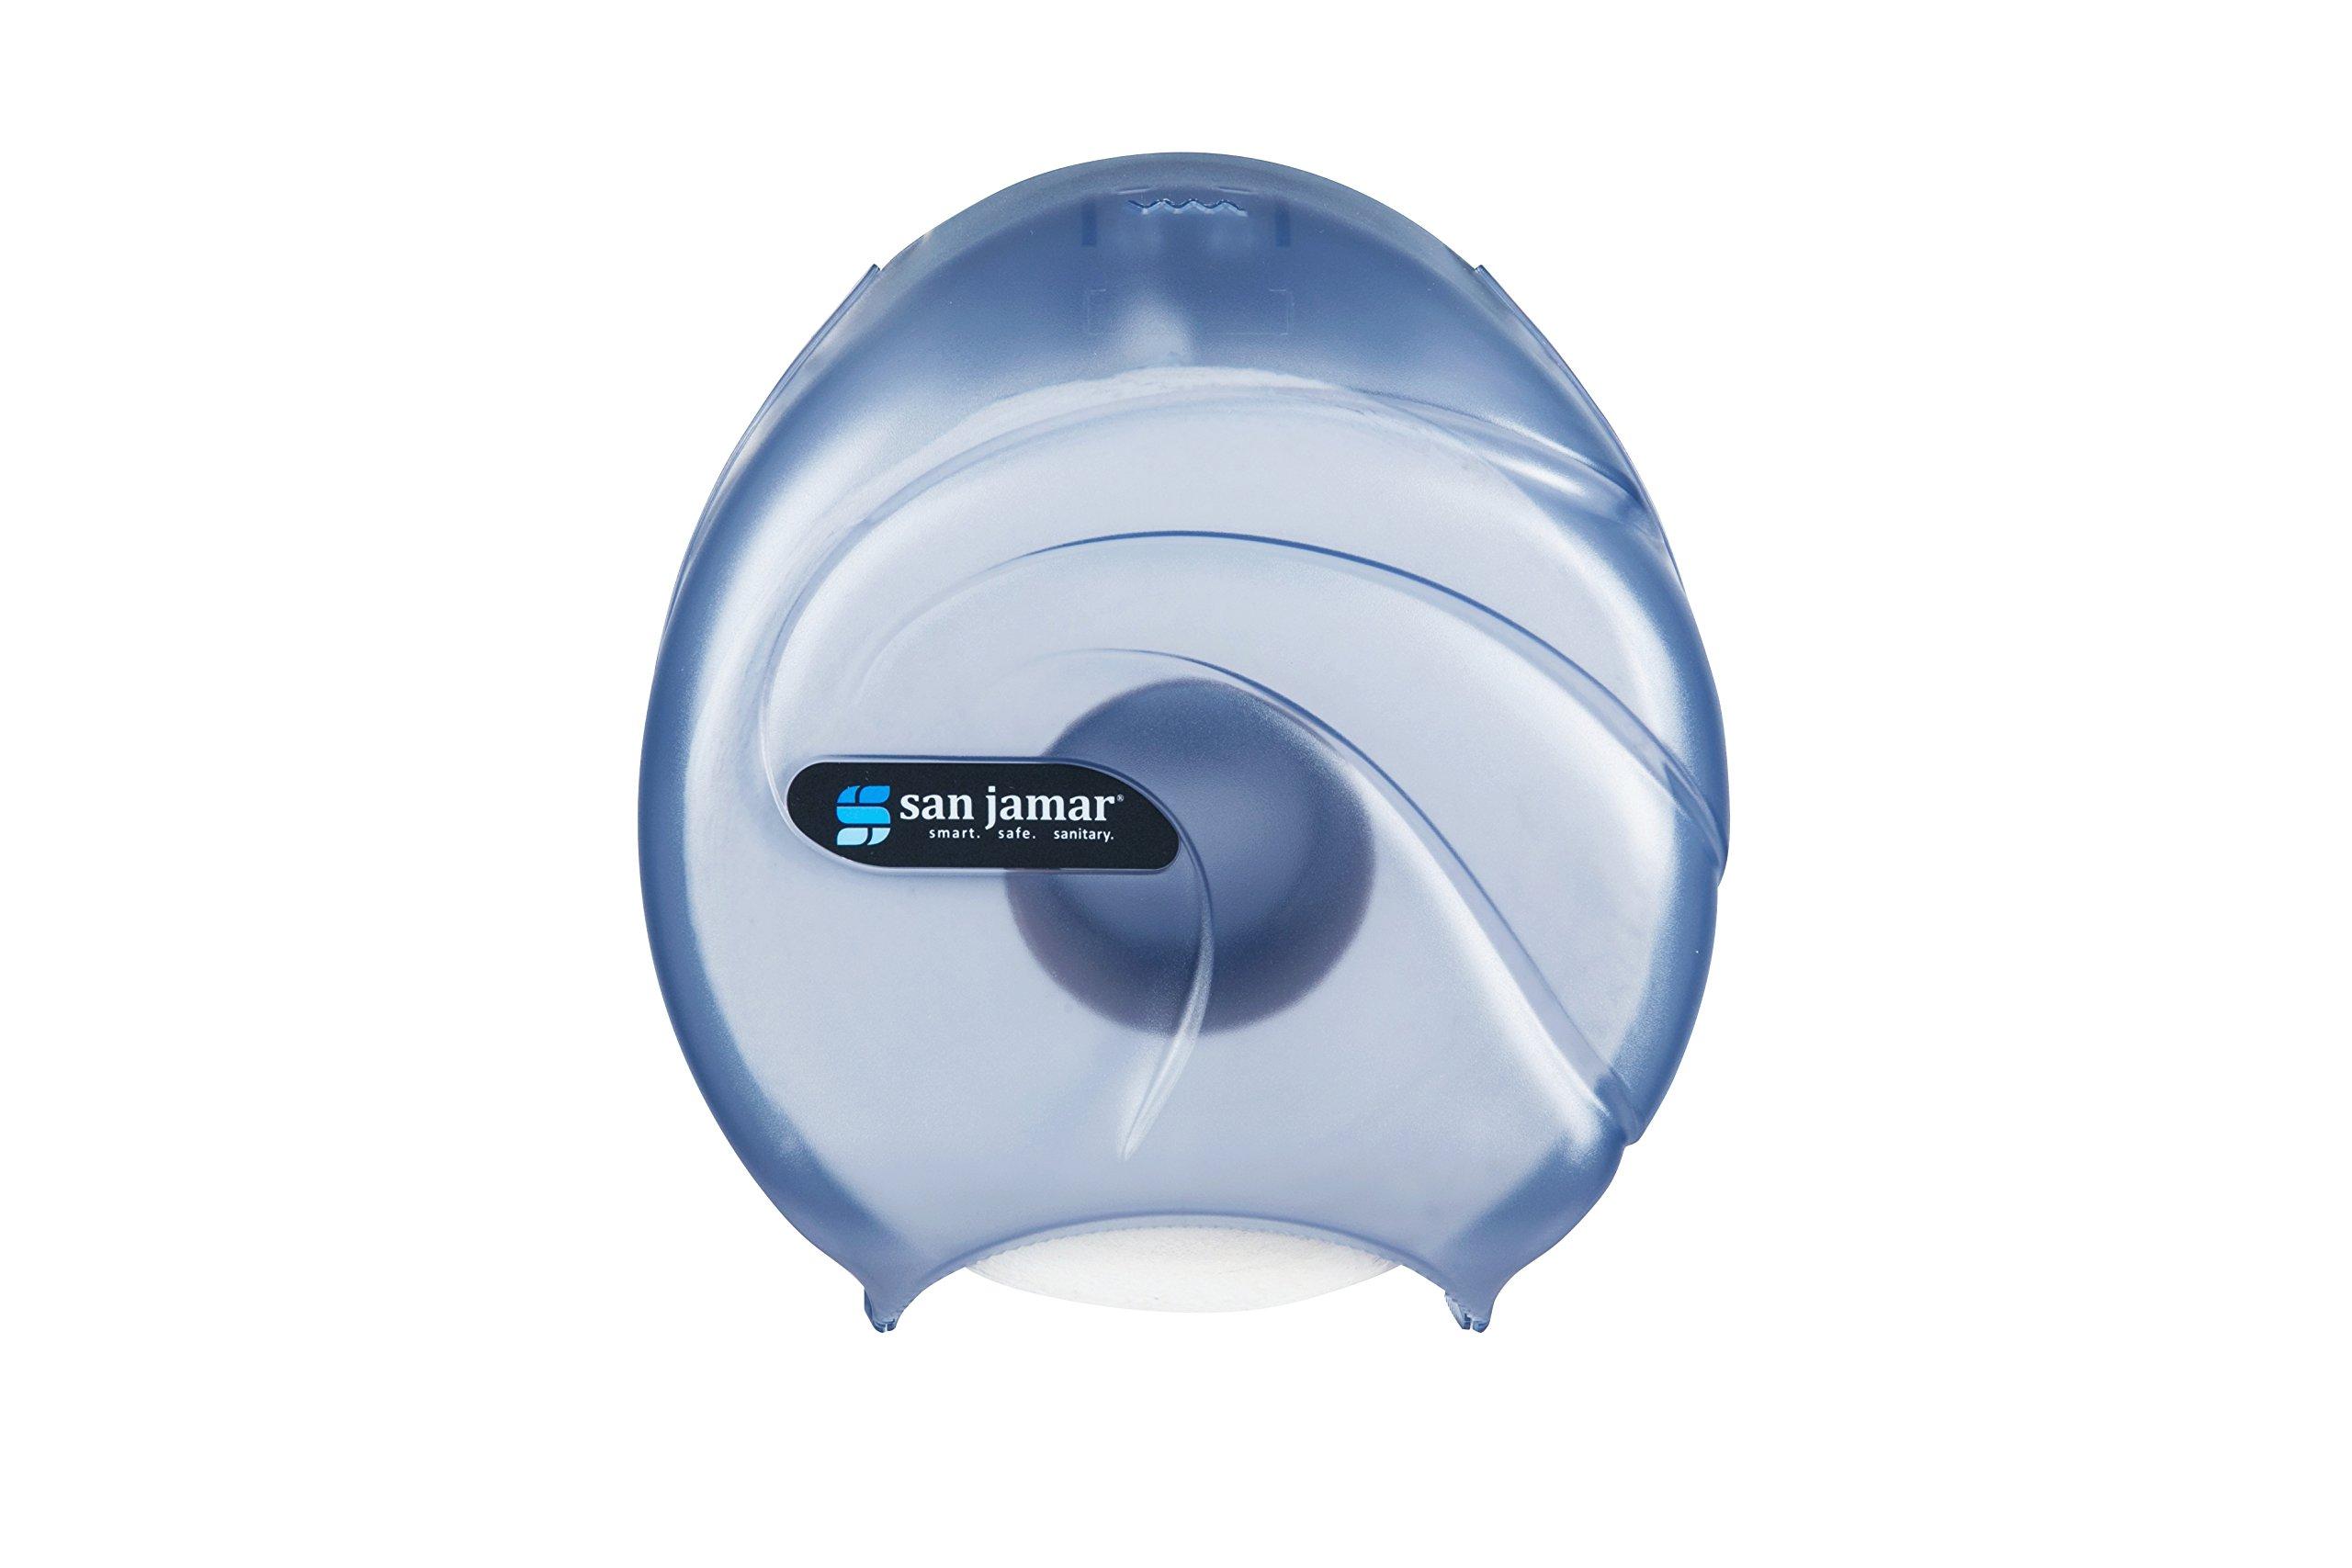 San Jamar R2090 Oceans Single 9'' Jumbo Bath Tissue Dispenser, 10-1/4'' Width x 12'' Height x 5-5/8'' Depth, Arctic Blue